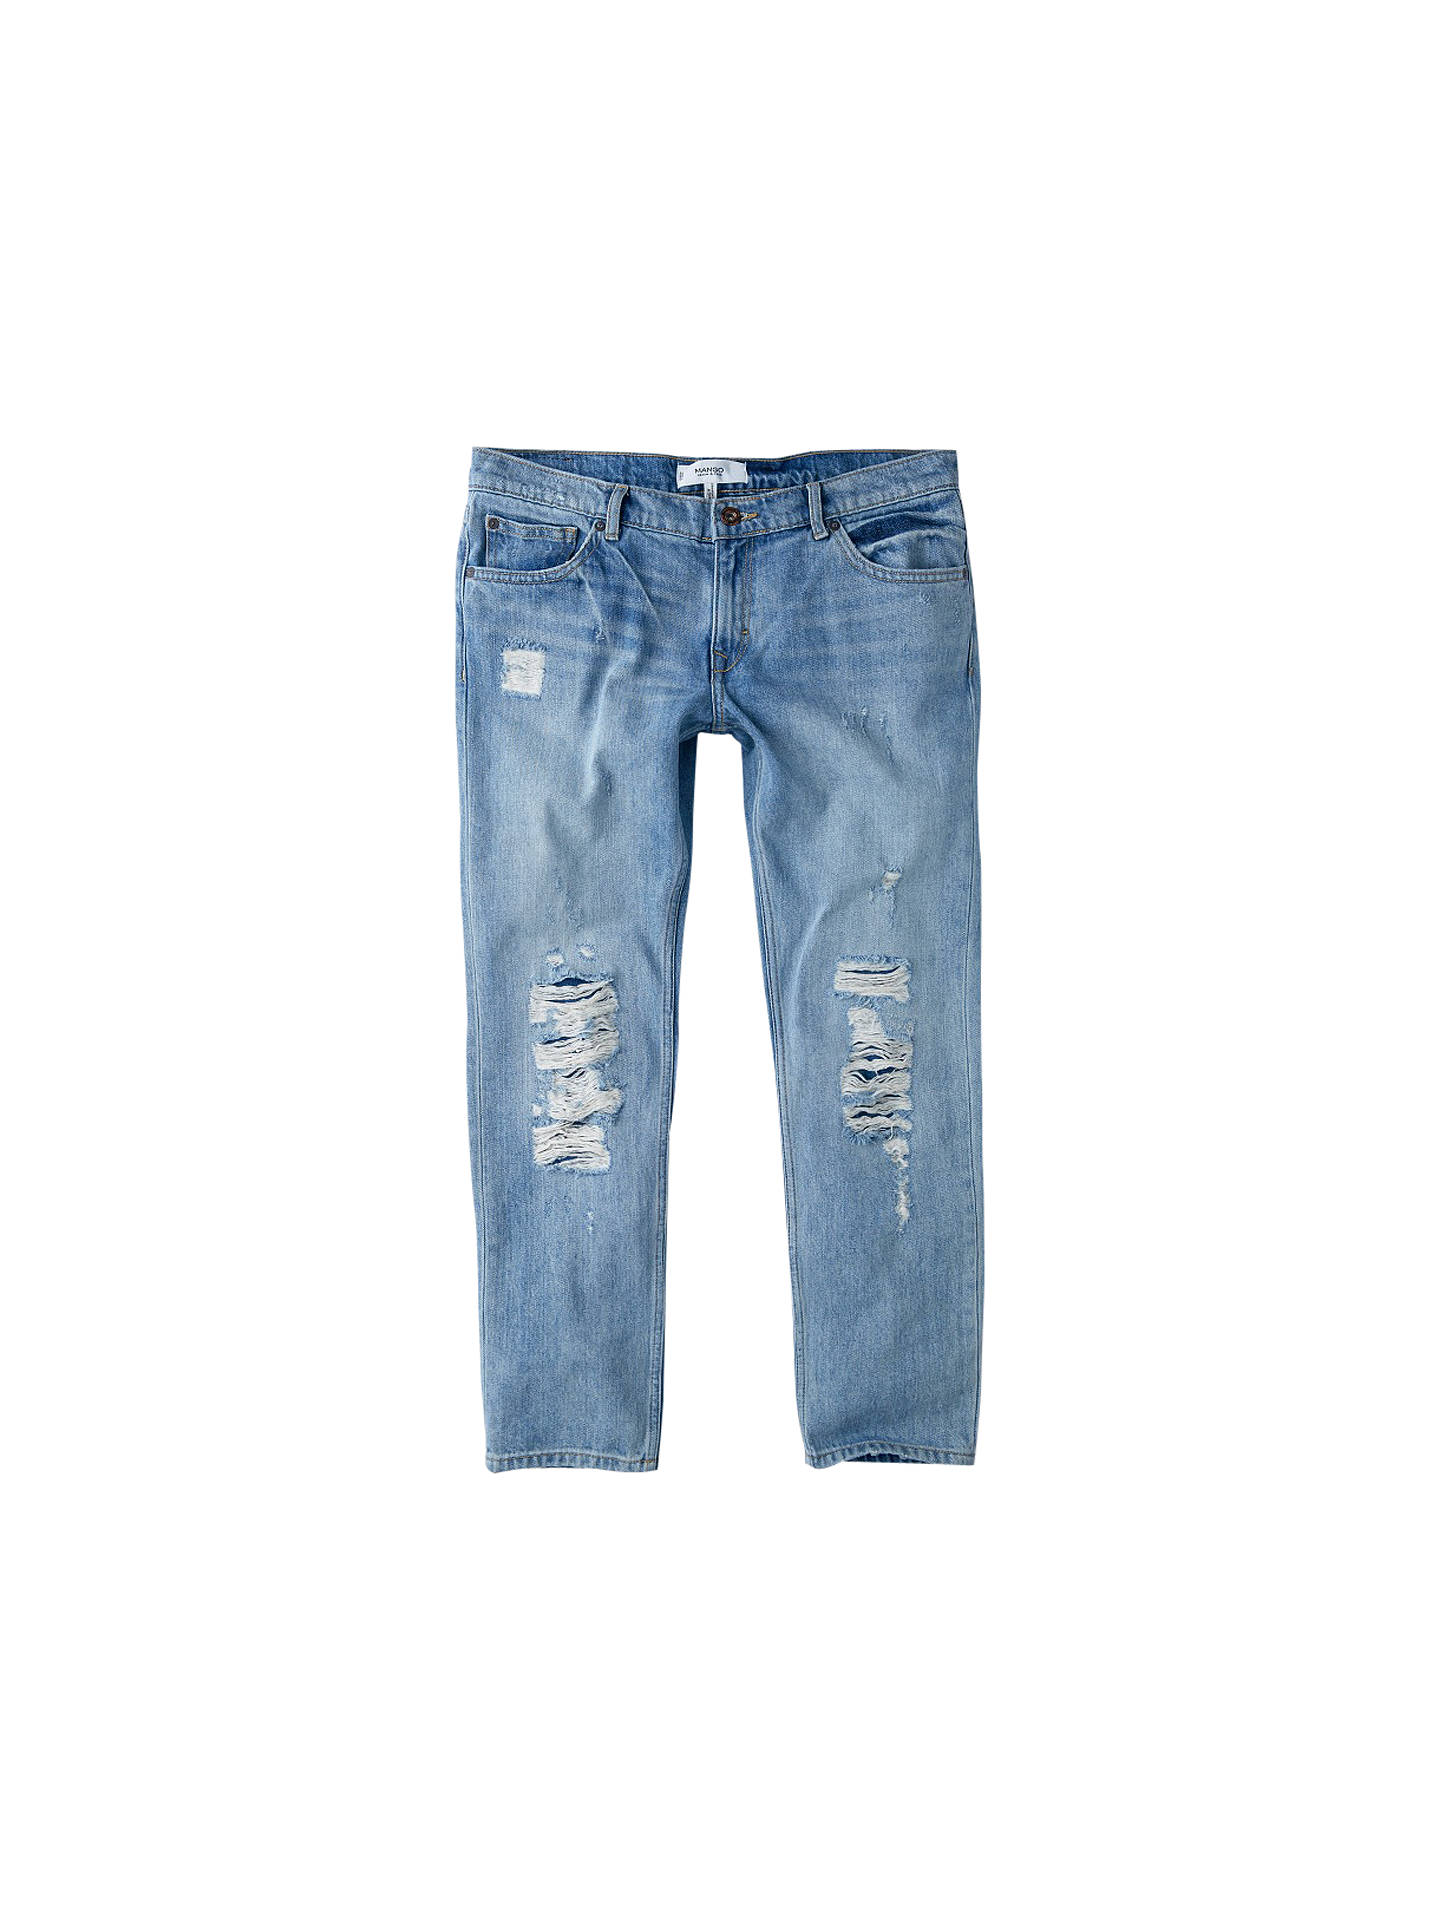 35f79716dc Mango Slim-Fit Cropped Nancy Jeans at John Lewis   Partners